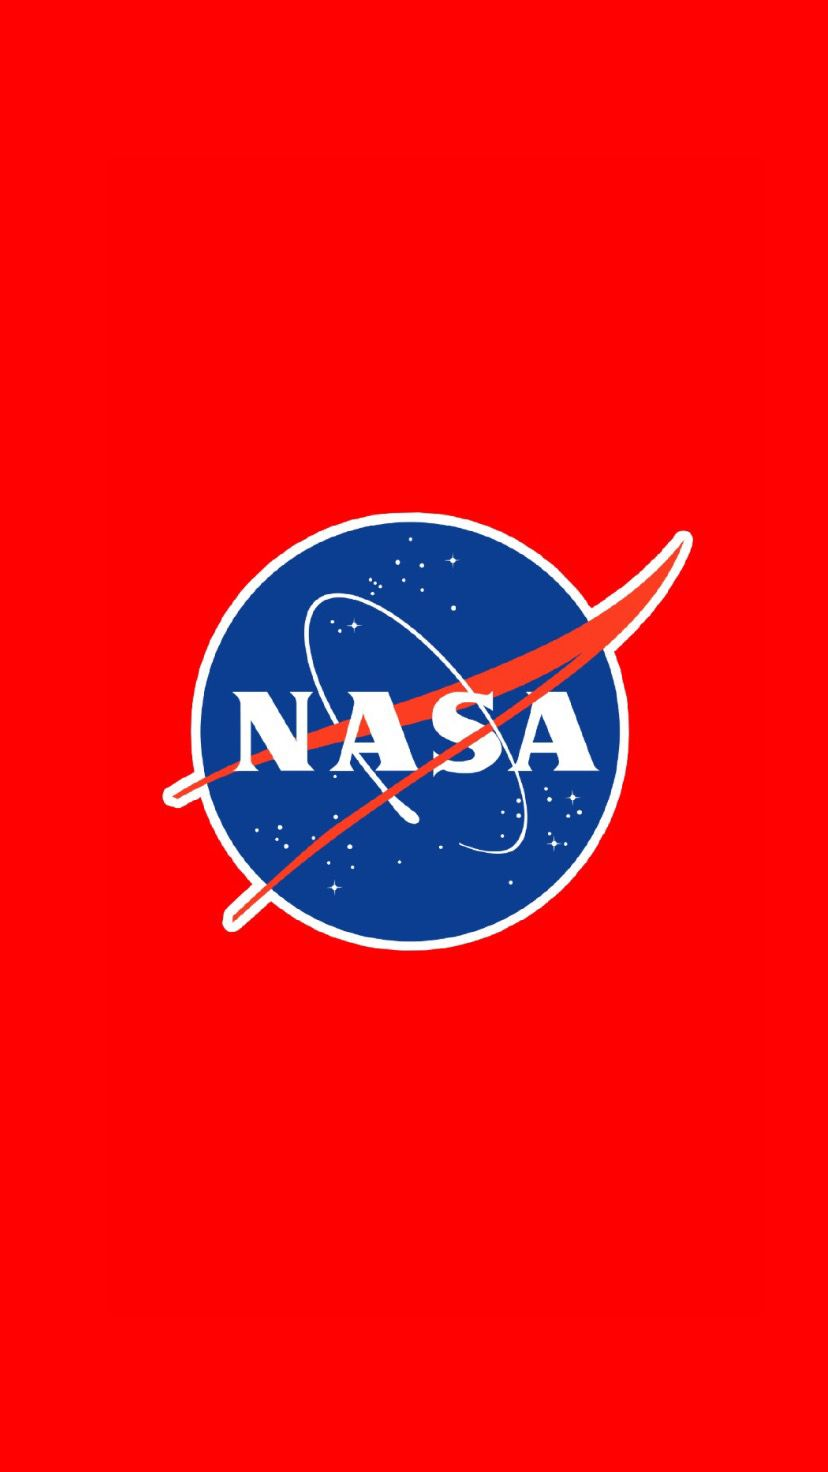 Here Is My Red Nasa Logo Wallpaper Nasa Wallpaper Hypebeast